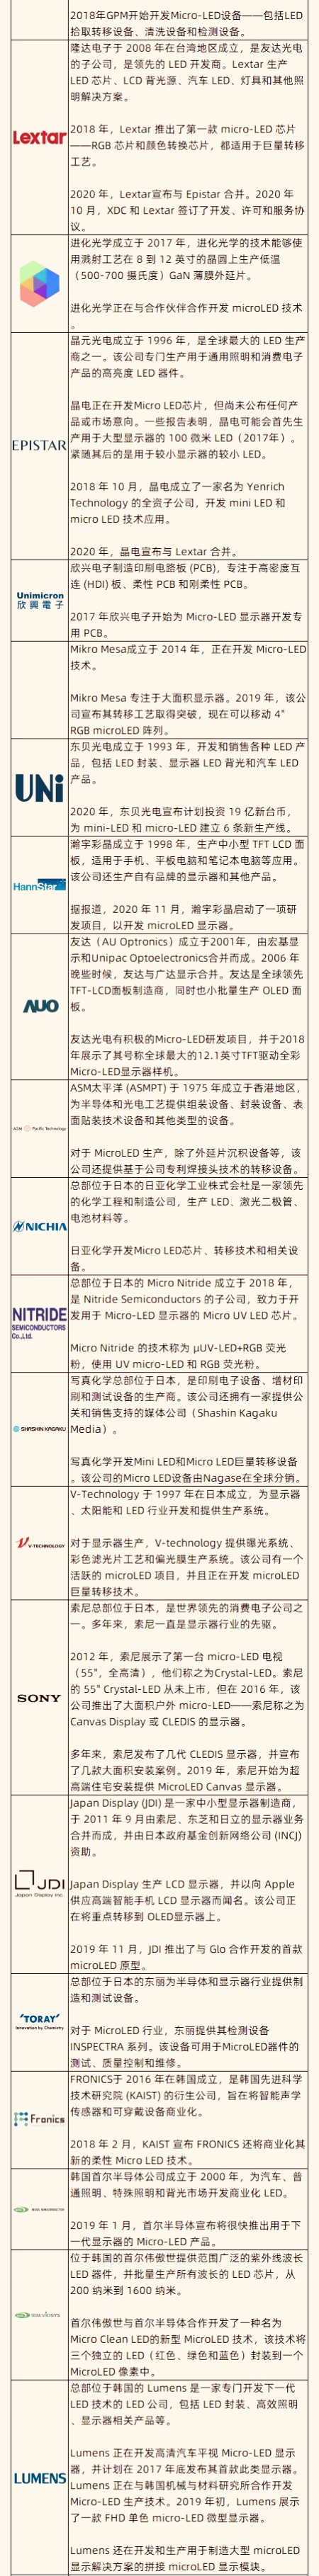 MicroLED全球厂商动态汇总2021年9月  第2张